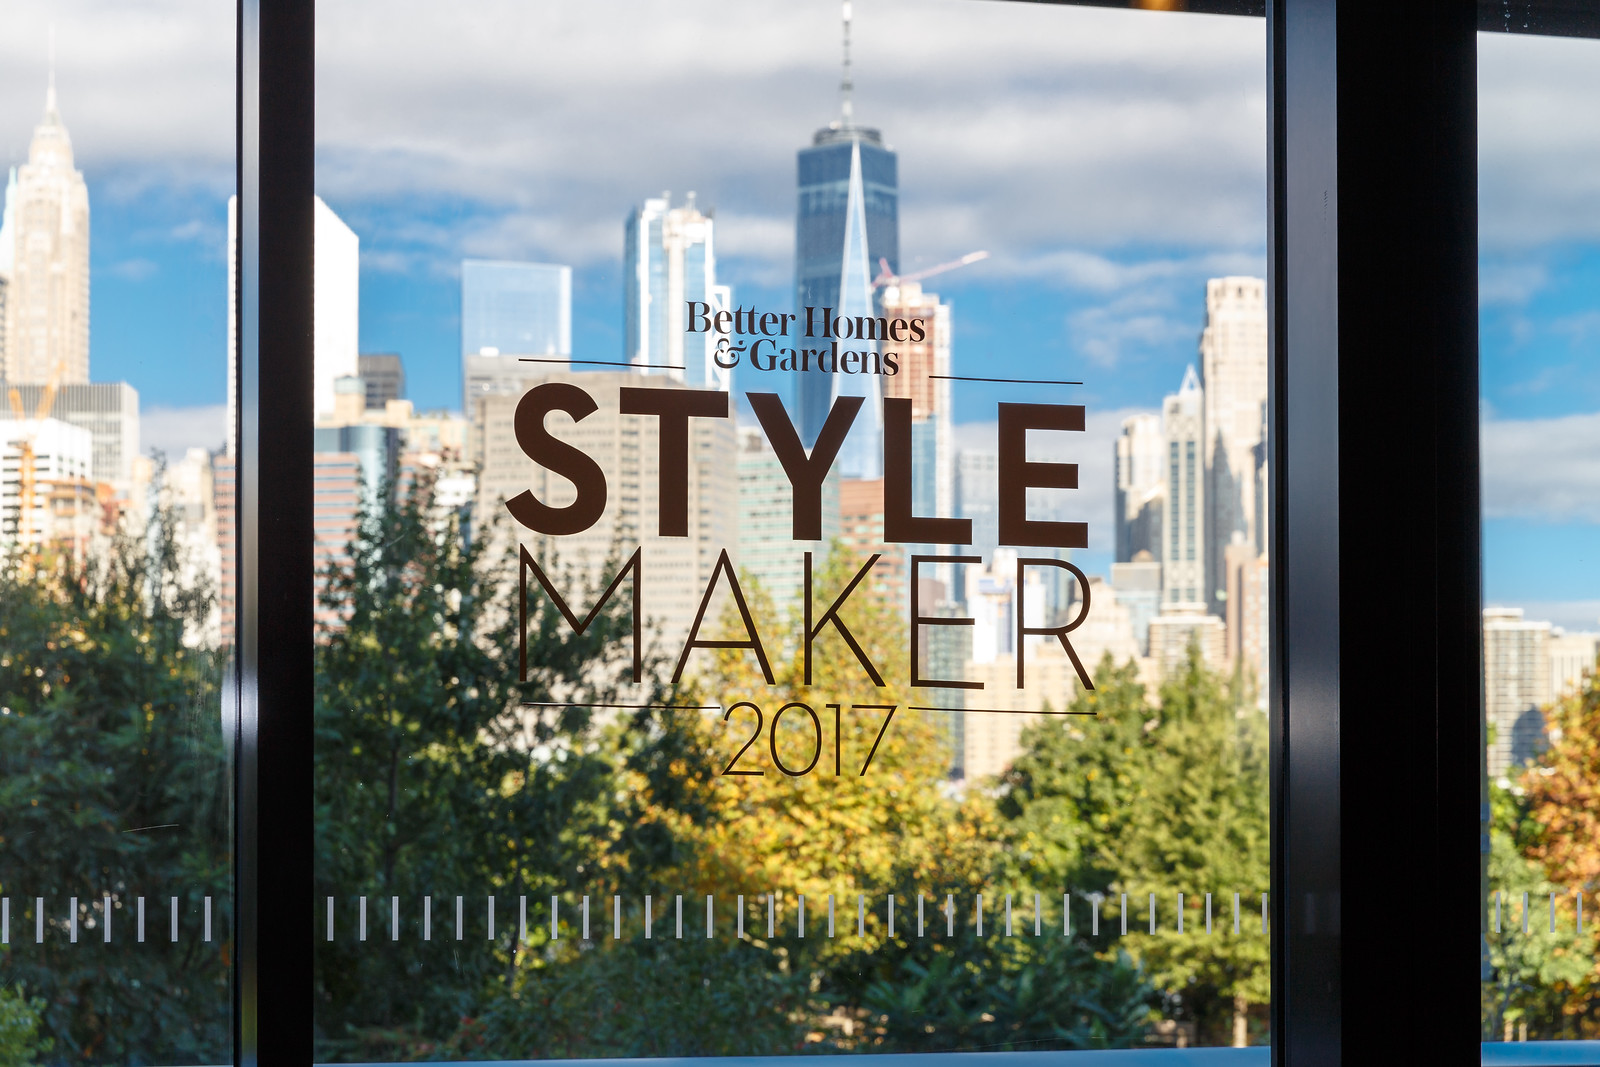 BHG Stylemaker 2017 kellyelko.com